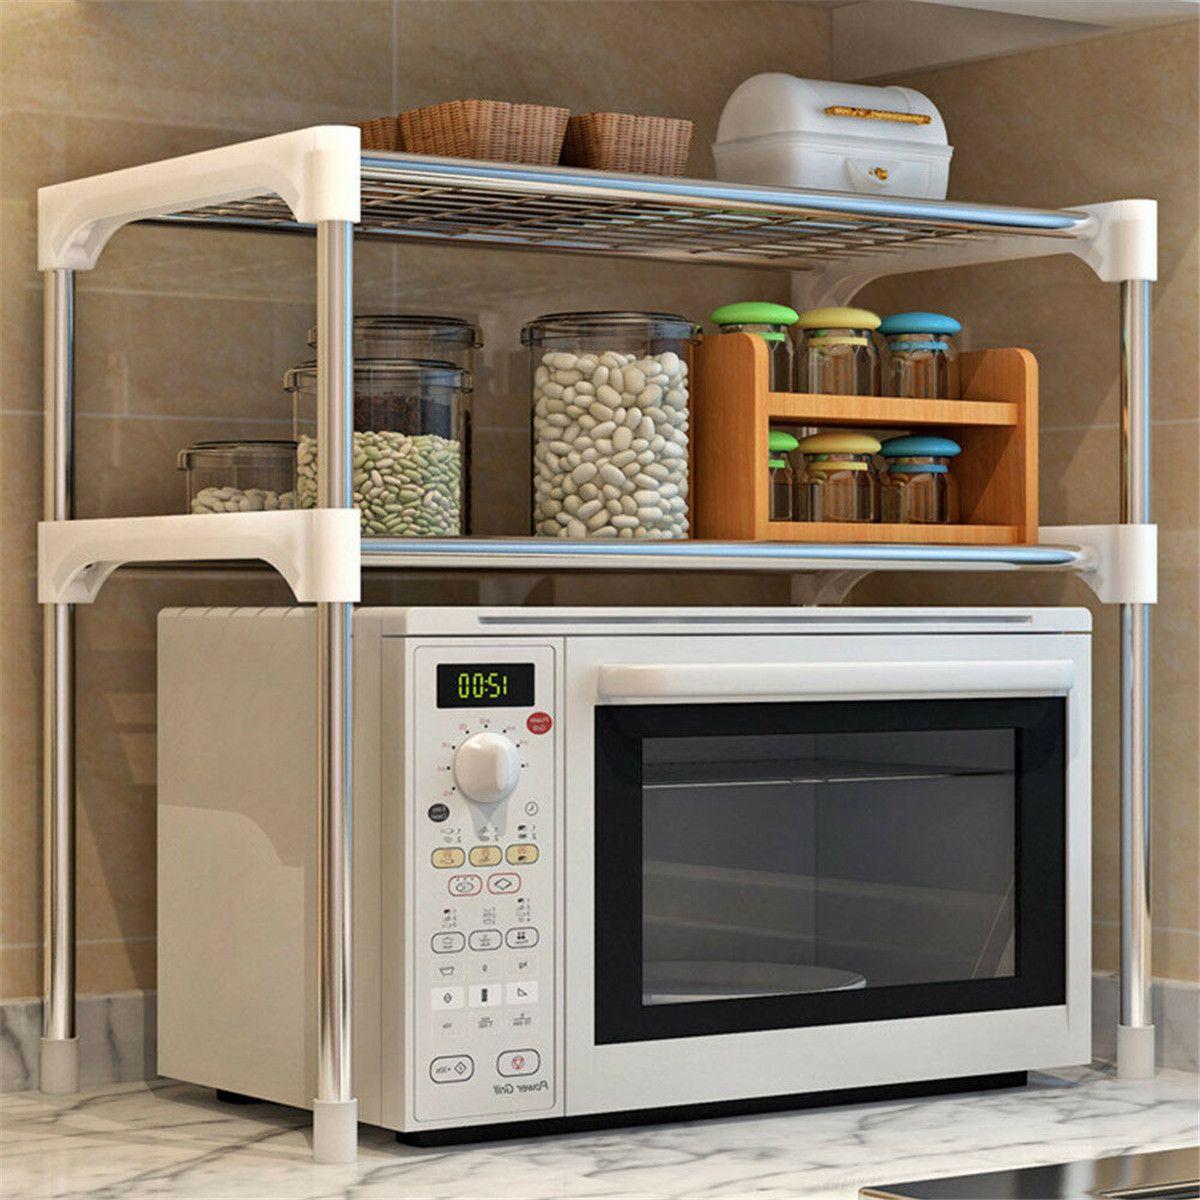 2-Tier 304 Stainless Steel Microwave Oven Rack Organizer Kitchen Rack Multifunctional Storage Shelf Bathroom Shelf Book Shelf